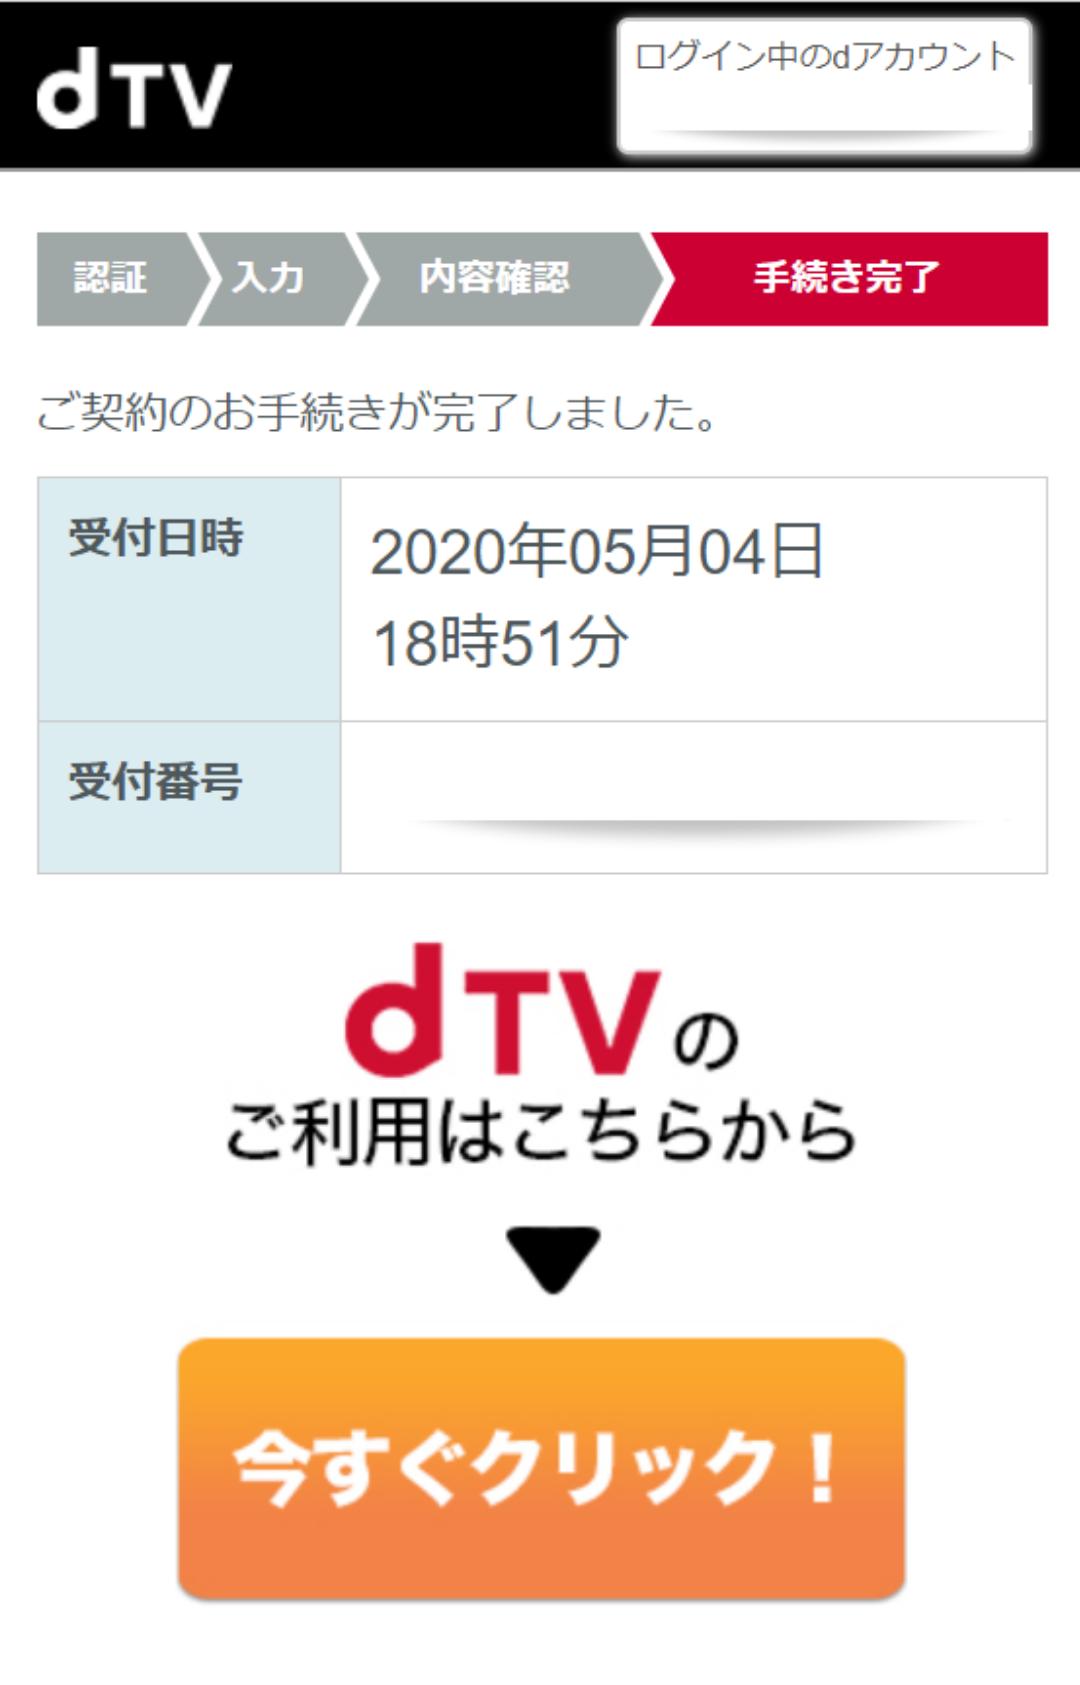 dTVの31日間無料お試しへの登録が完了